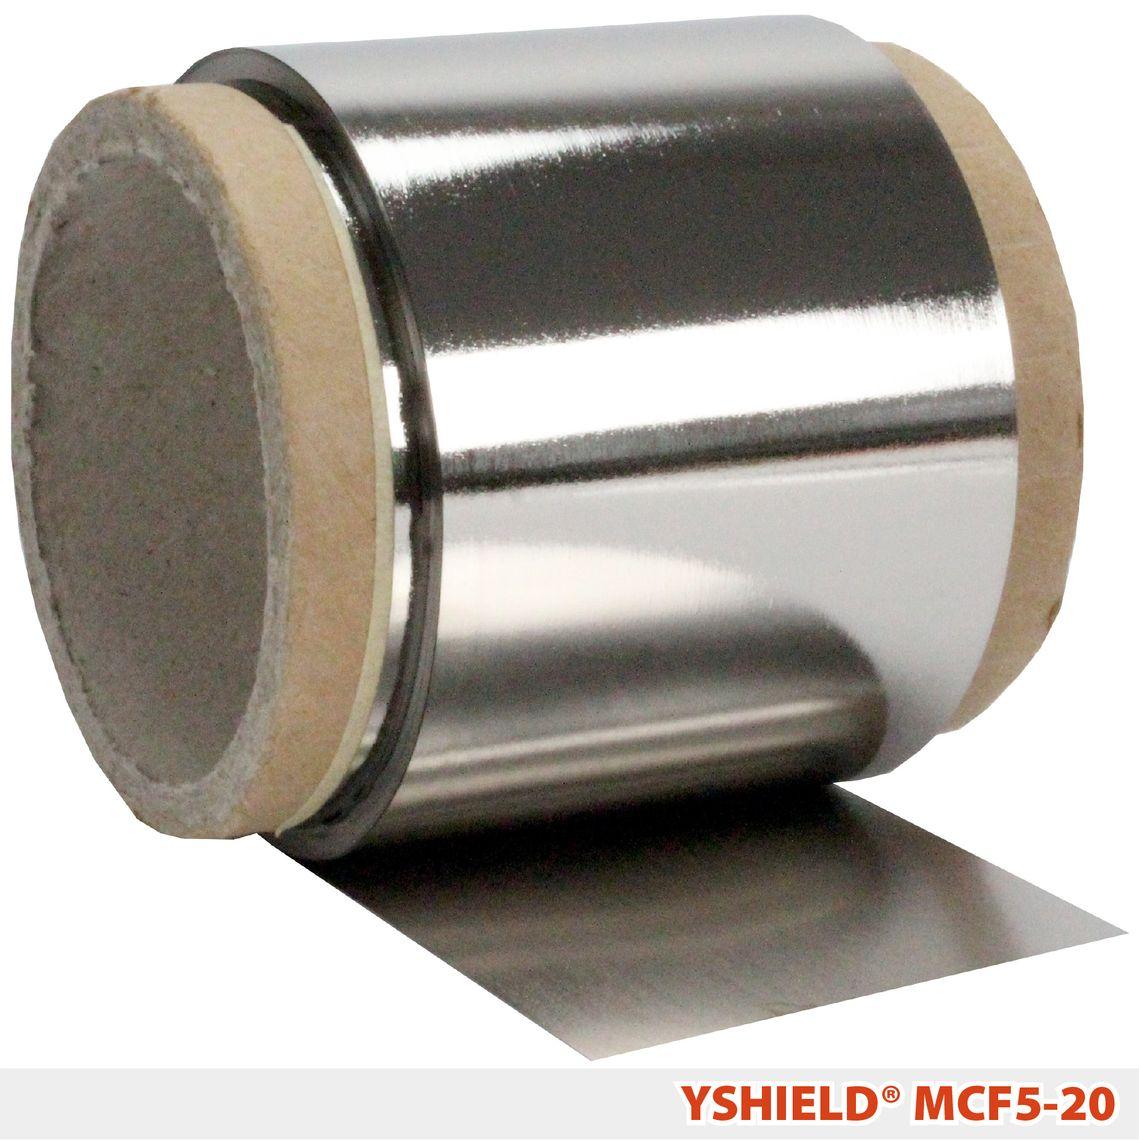 YSHIELD® MCF5   Magnetfeld-Abschirmfolie   Breite 5 cm   20 Meter